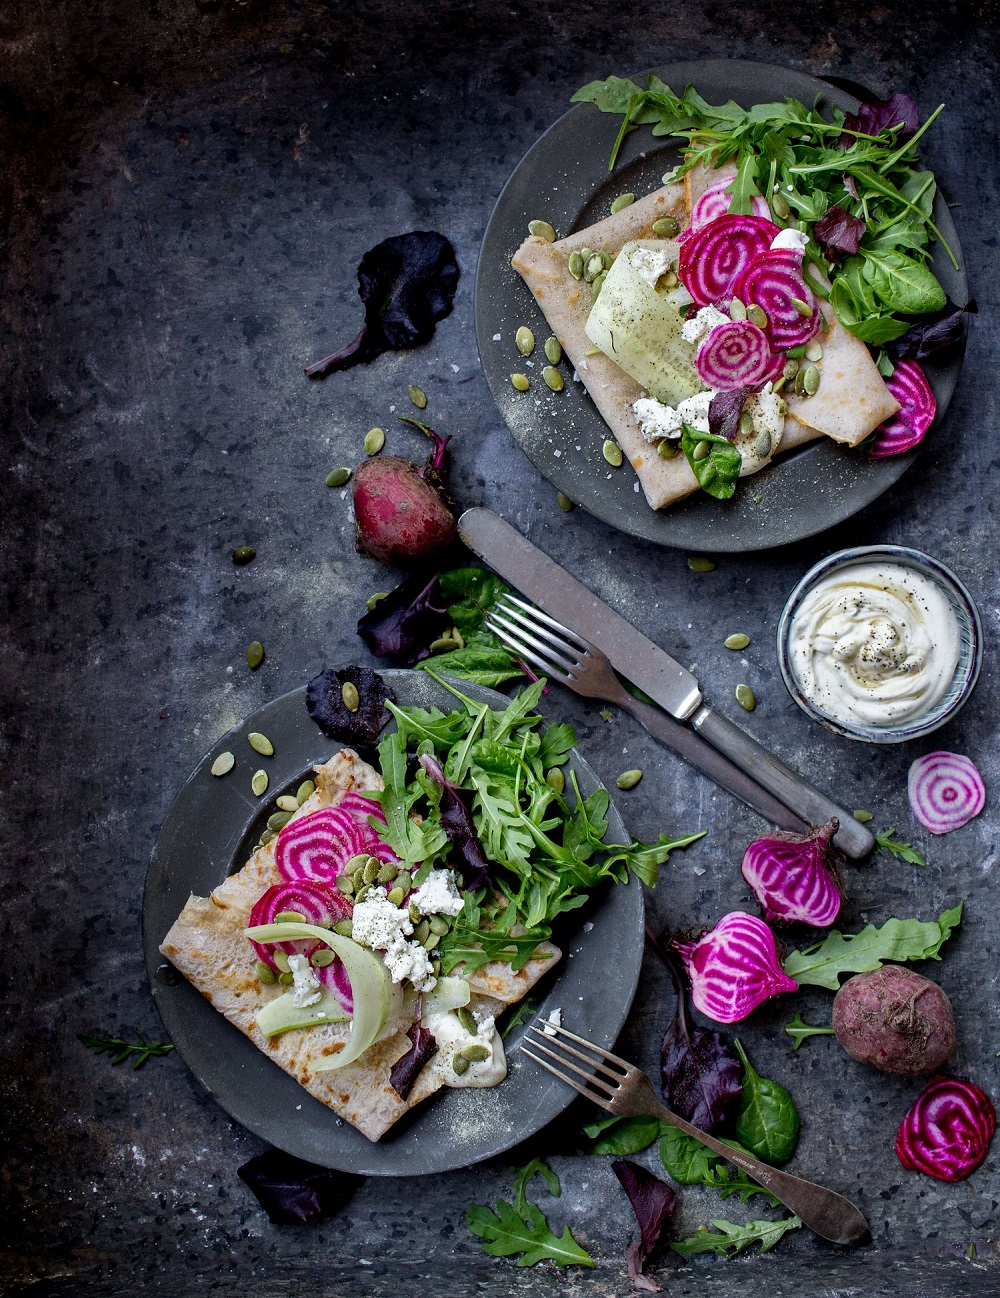 glutenfria-pannkakor-recept-bovete-galette-vegetarisk-frukost-lunch